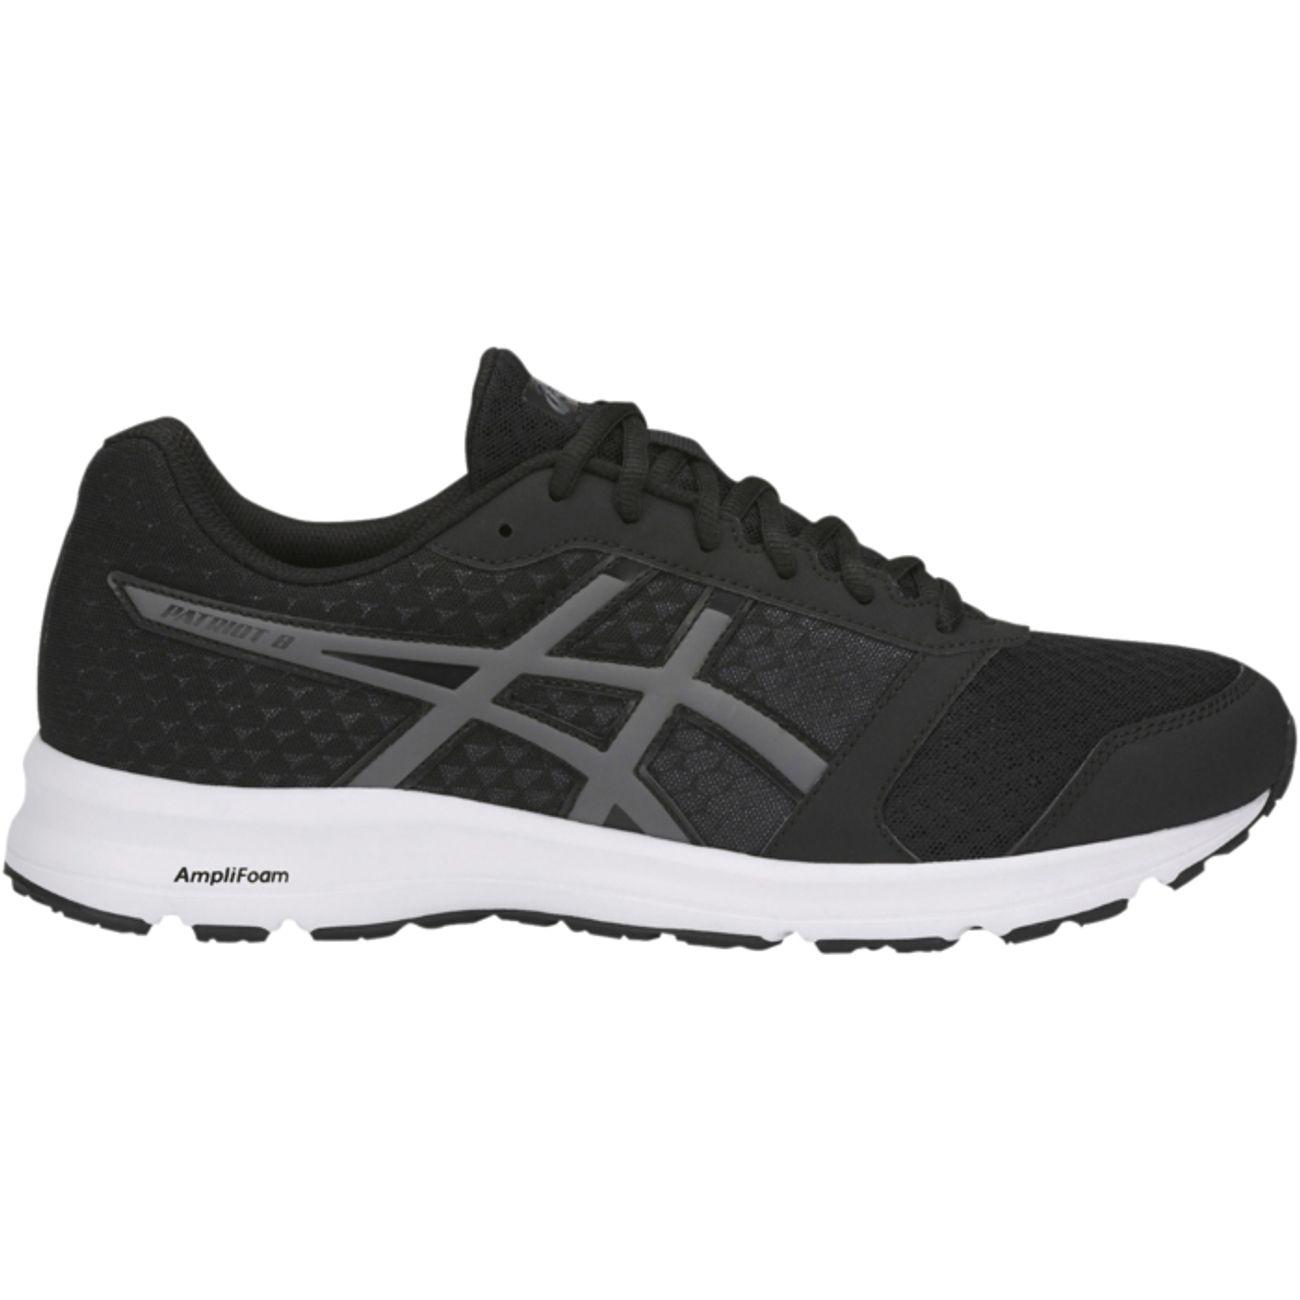 chaussures de running asics patriot 9 achat et prix pas cher go sport. Black Bedroom Furniture Sets. Home Design Ideas